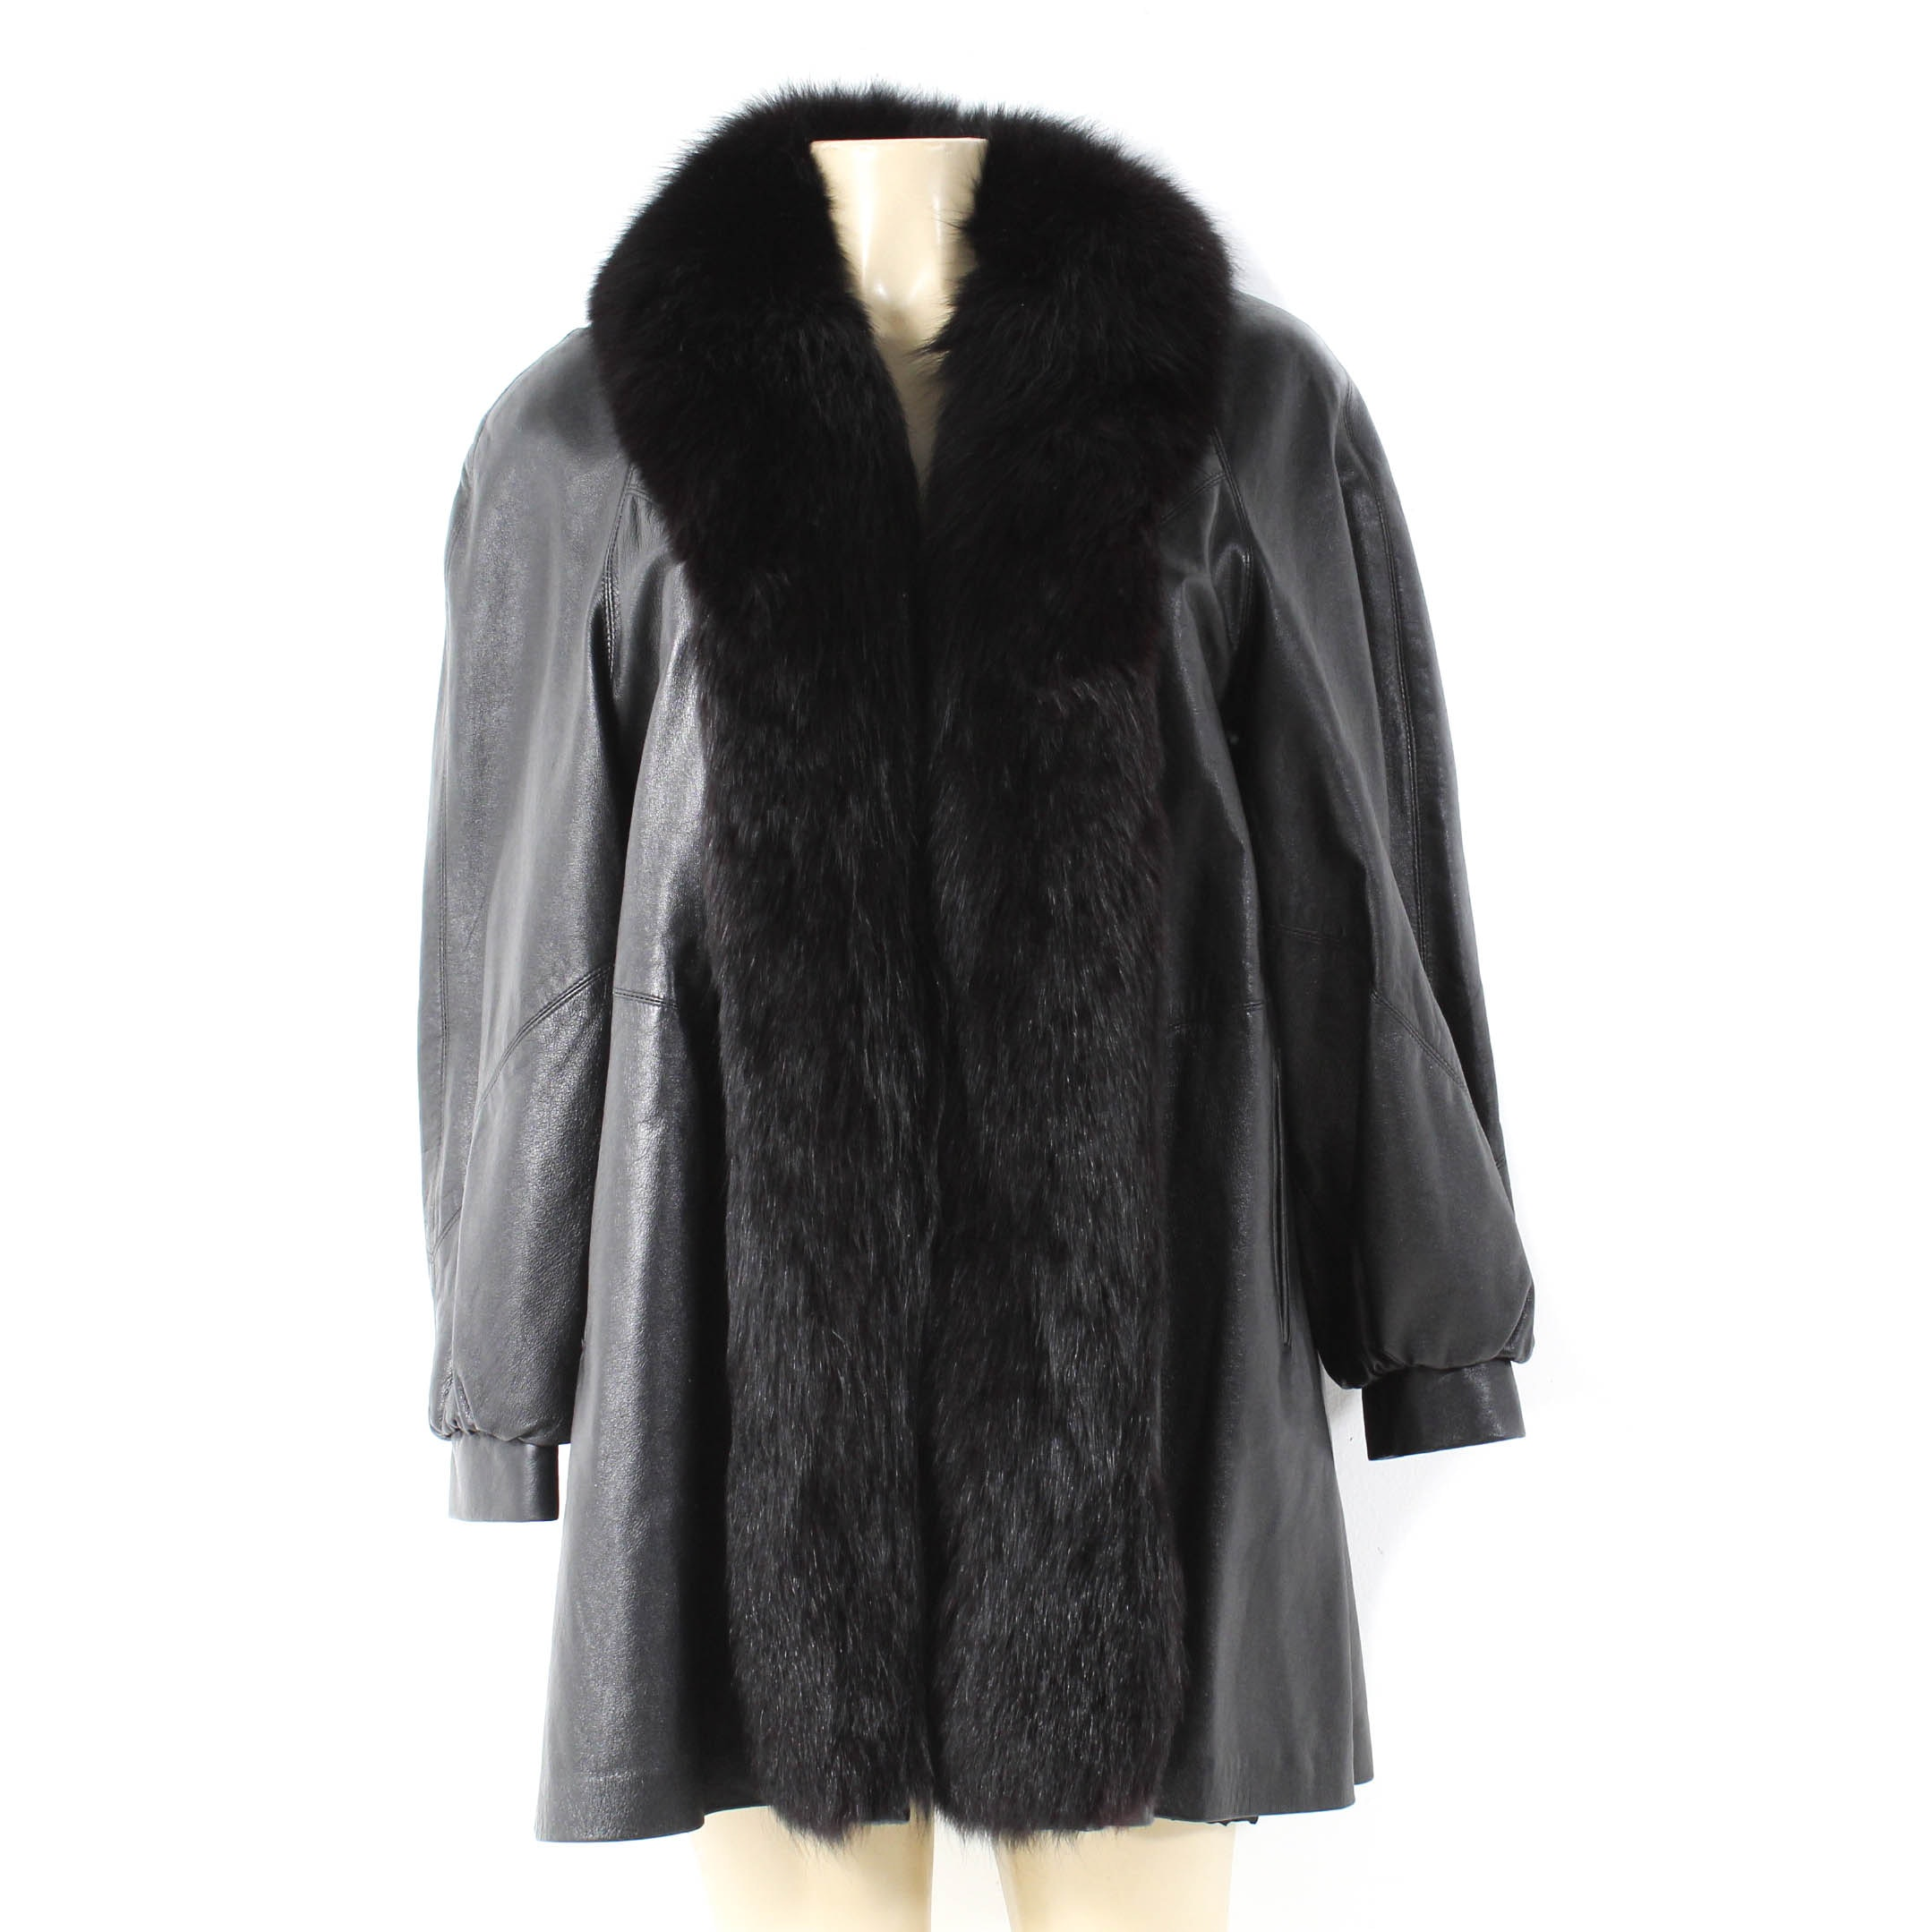 Vintage Leather Coat with Black Fox Fur Tuxedo Collar